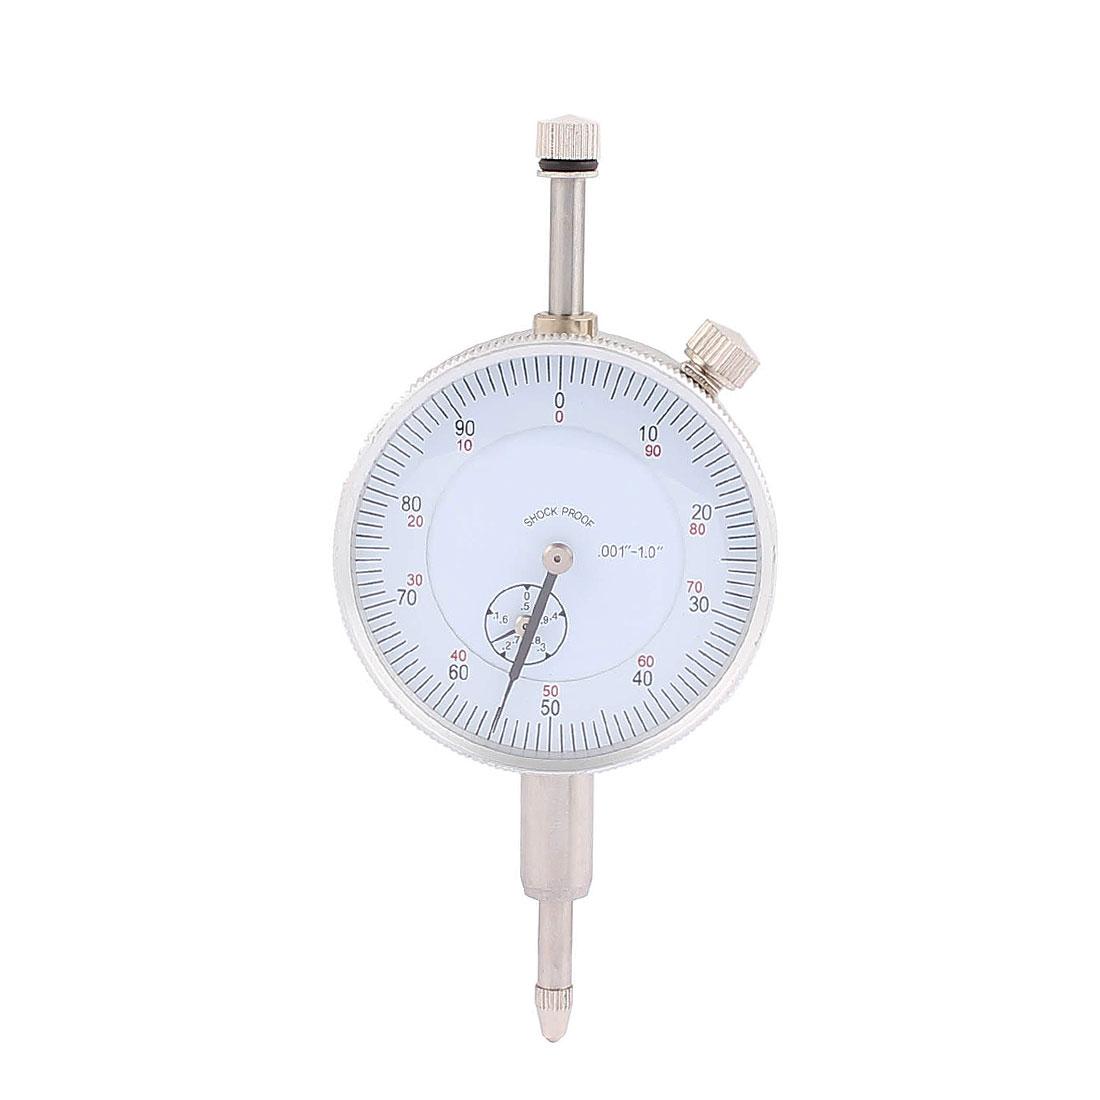 0-1inch Range Measurement Instrument Dial Indicator Gauge Precision Tool B-10